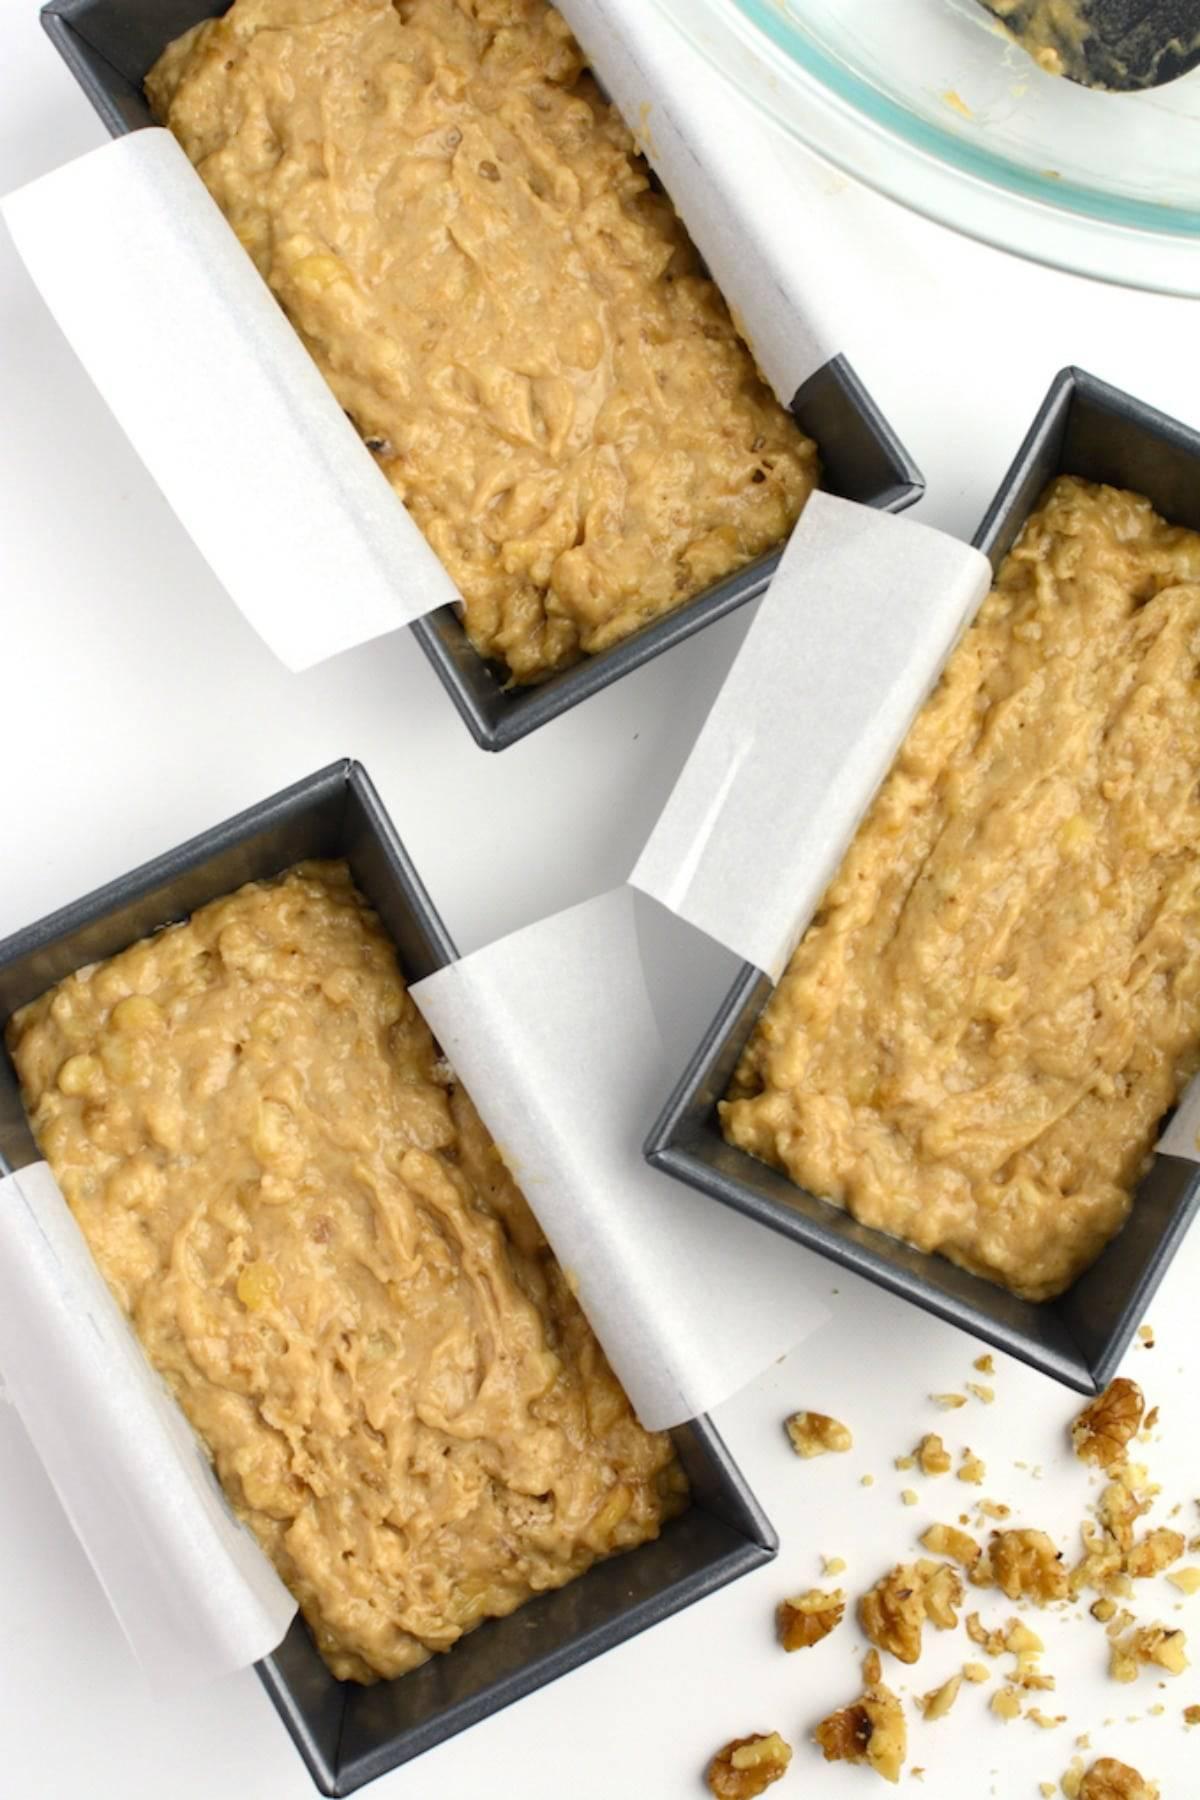 Vegan banana bread batter in mini loaf pans.